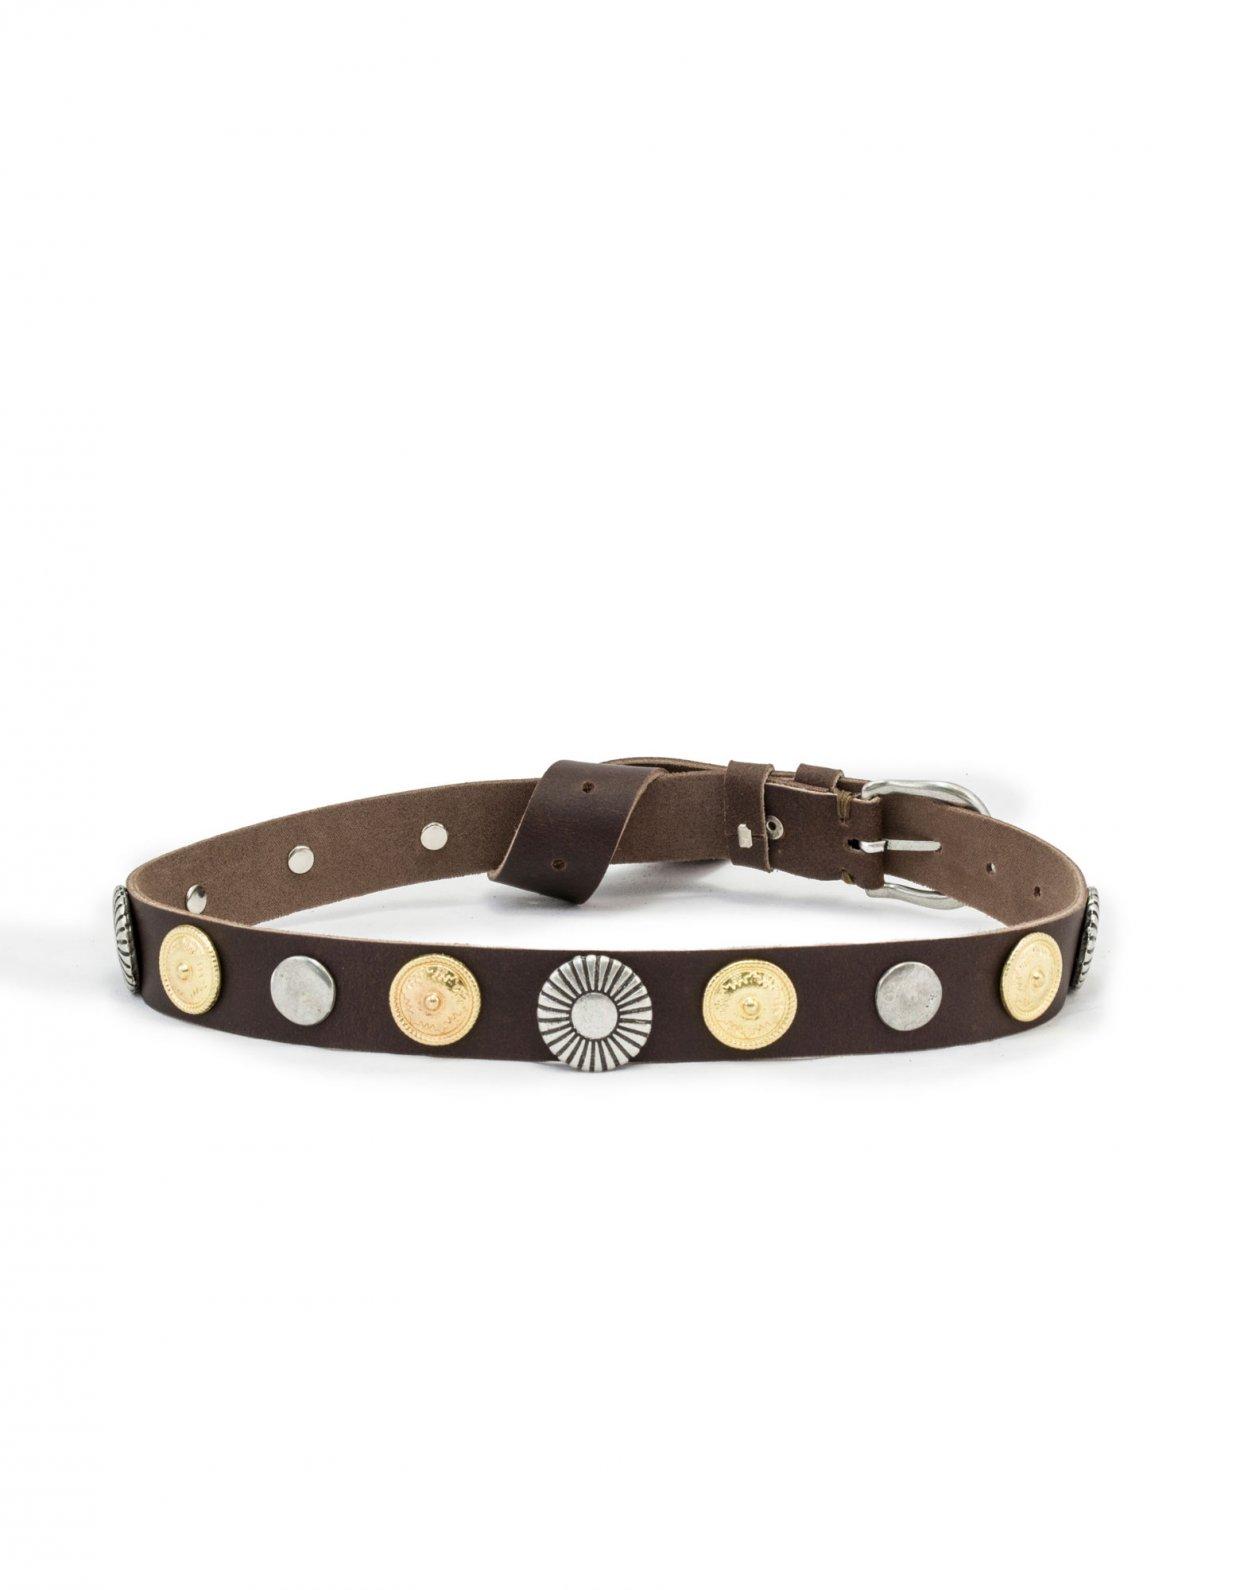 Individual Art Leather Grenade brown belt